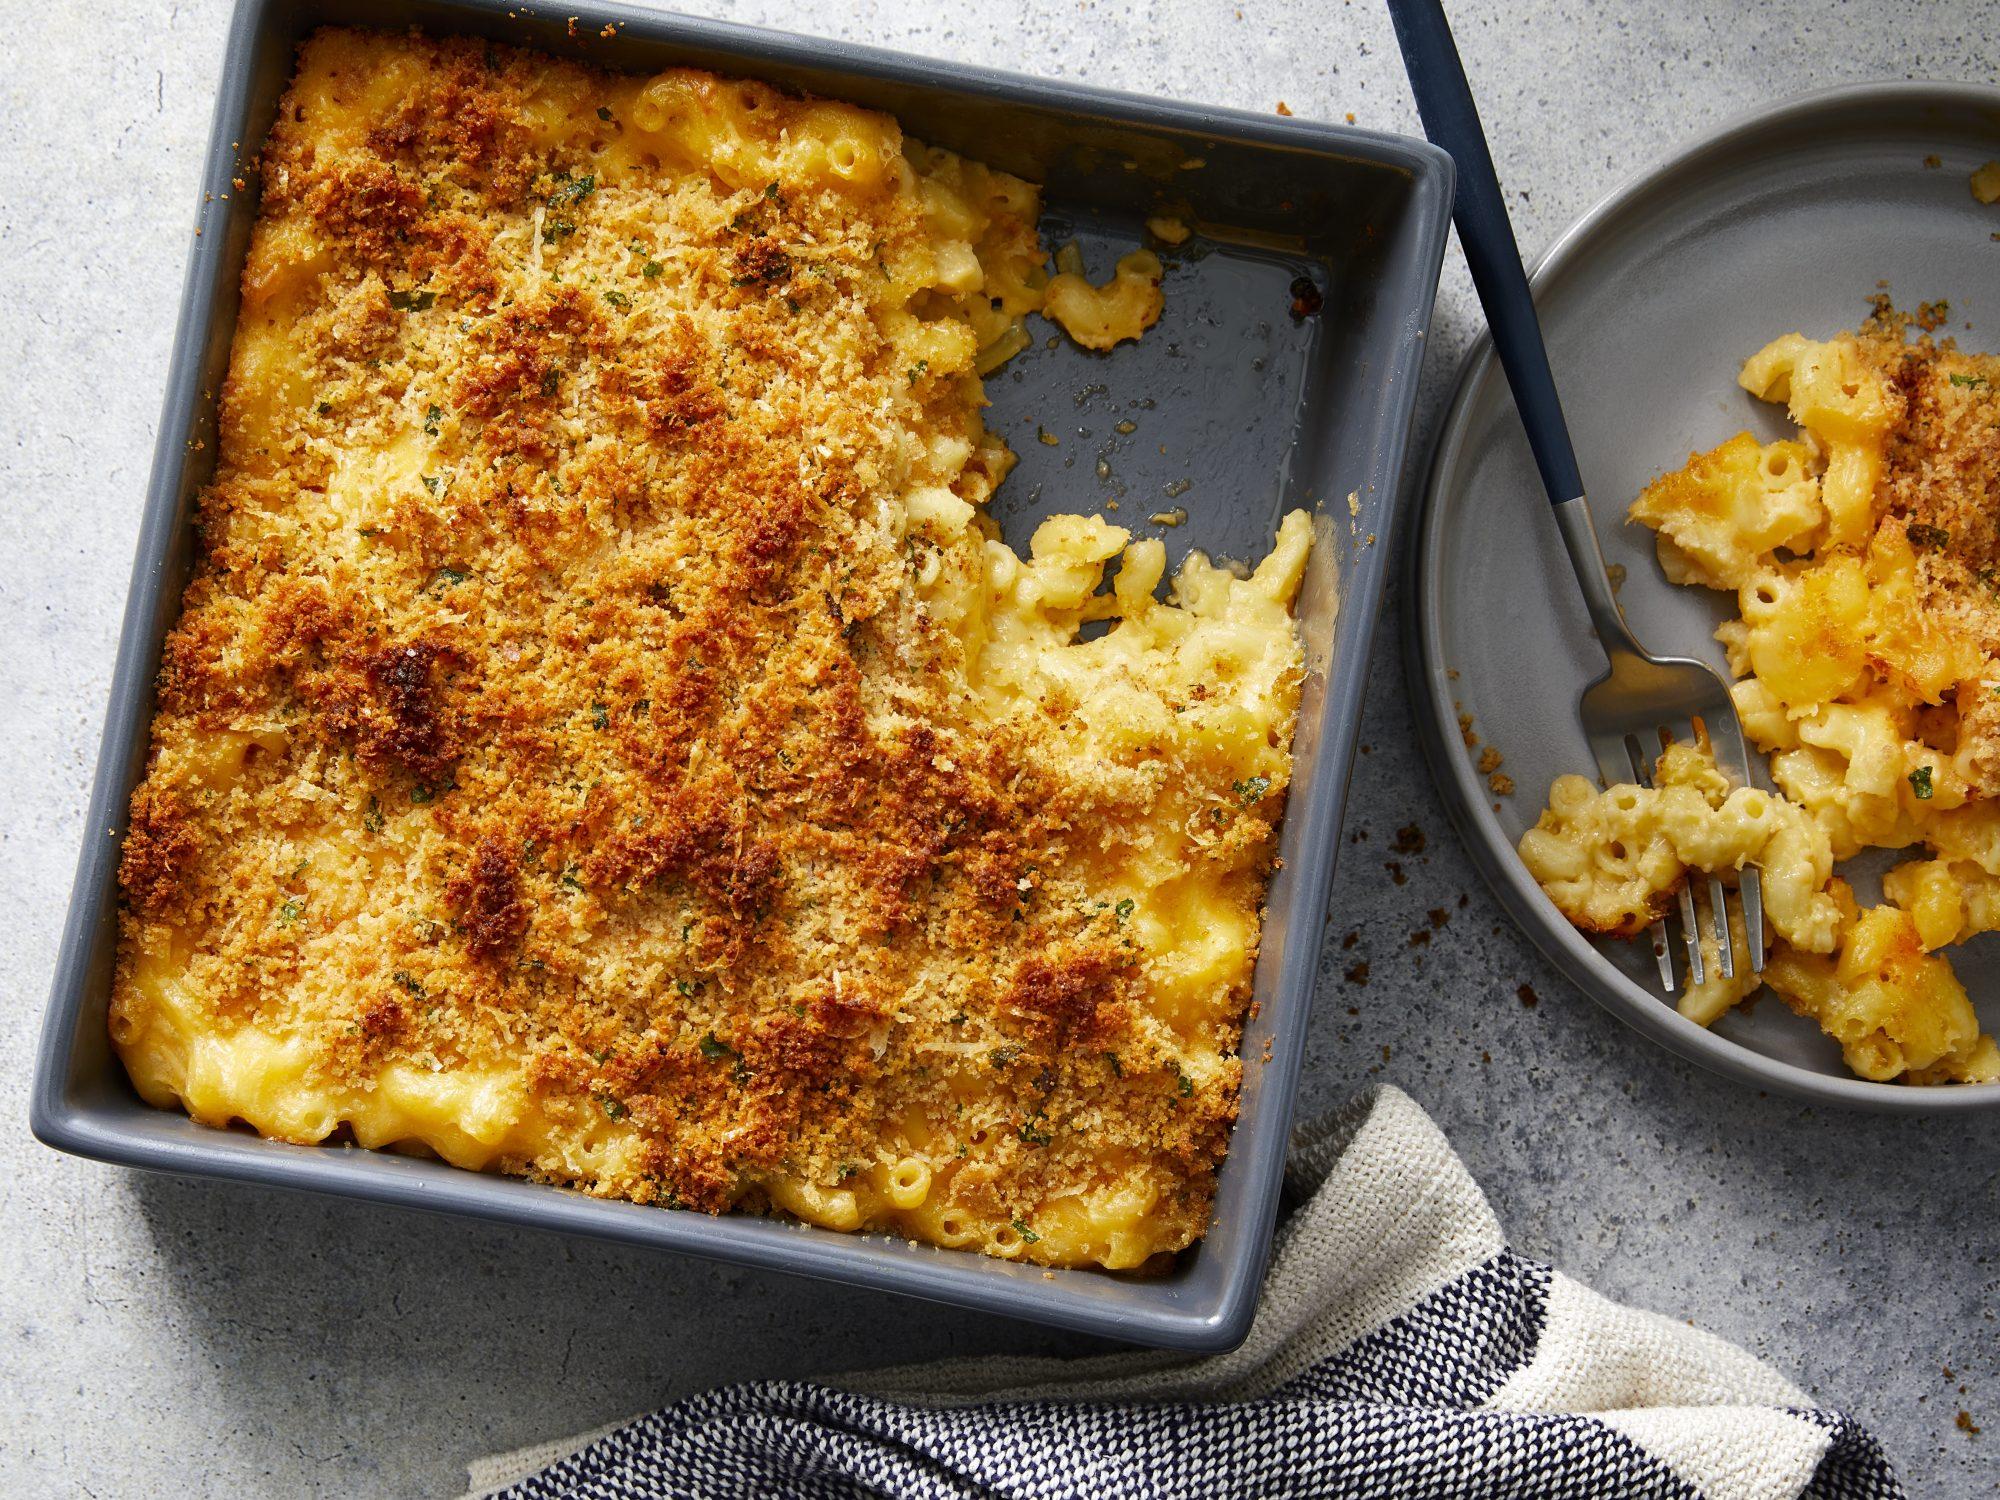 mr- baked macaroni and cheese reshoot